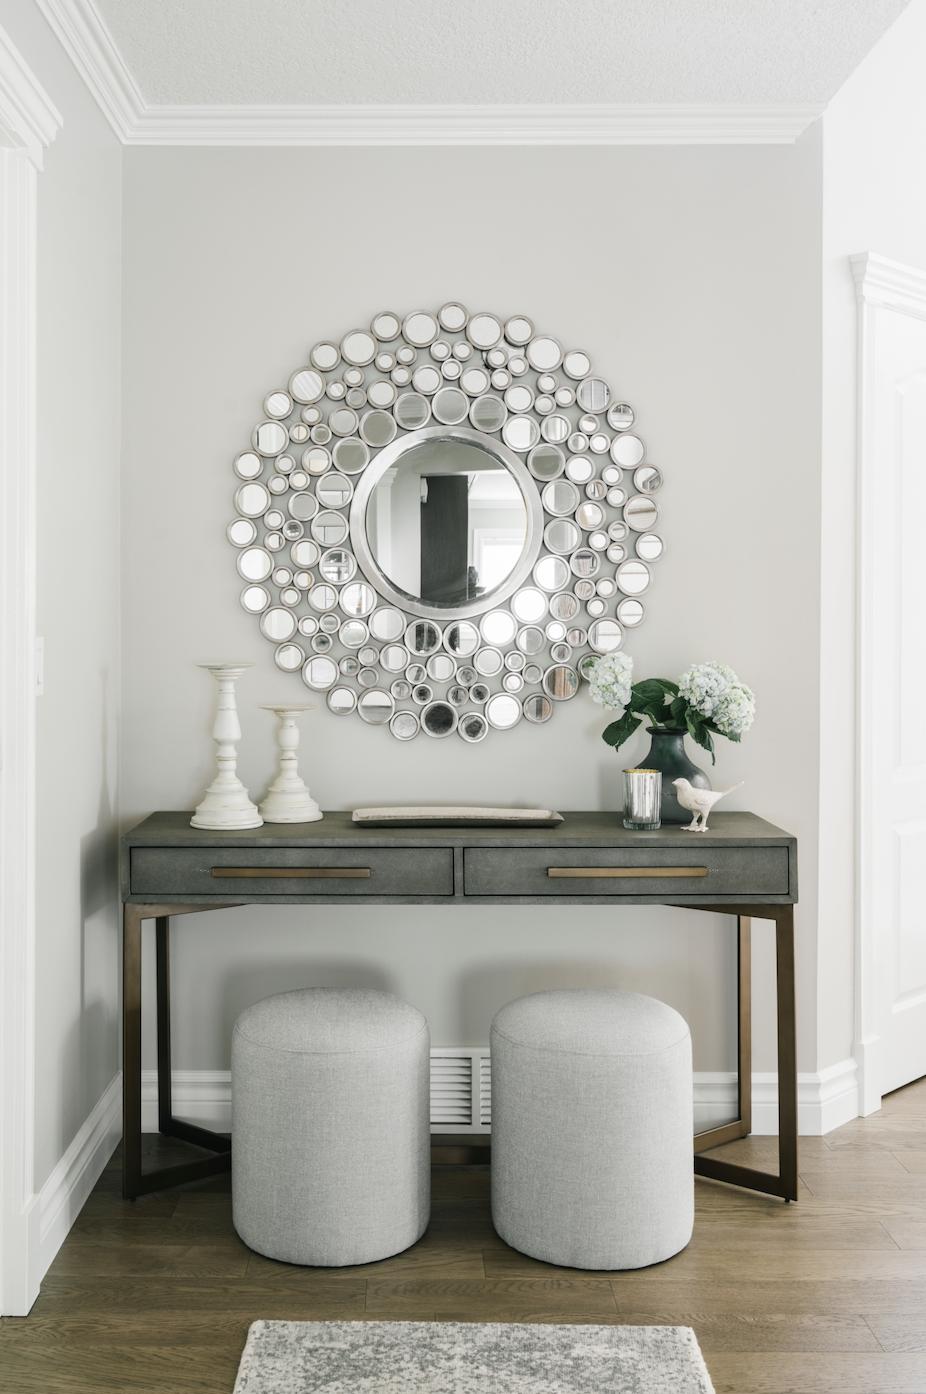 circle mirror ottomans candlesticks vignette desk silver matter brass calgary design